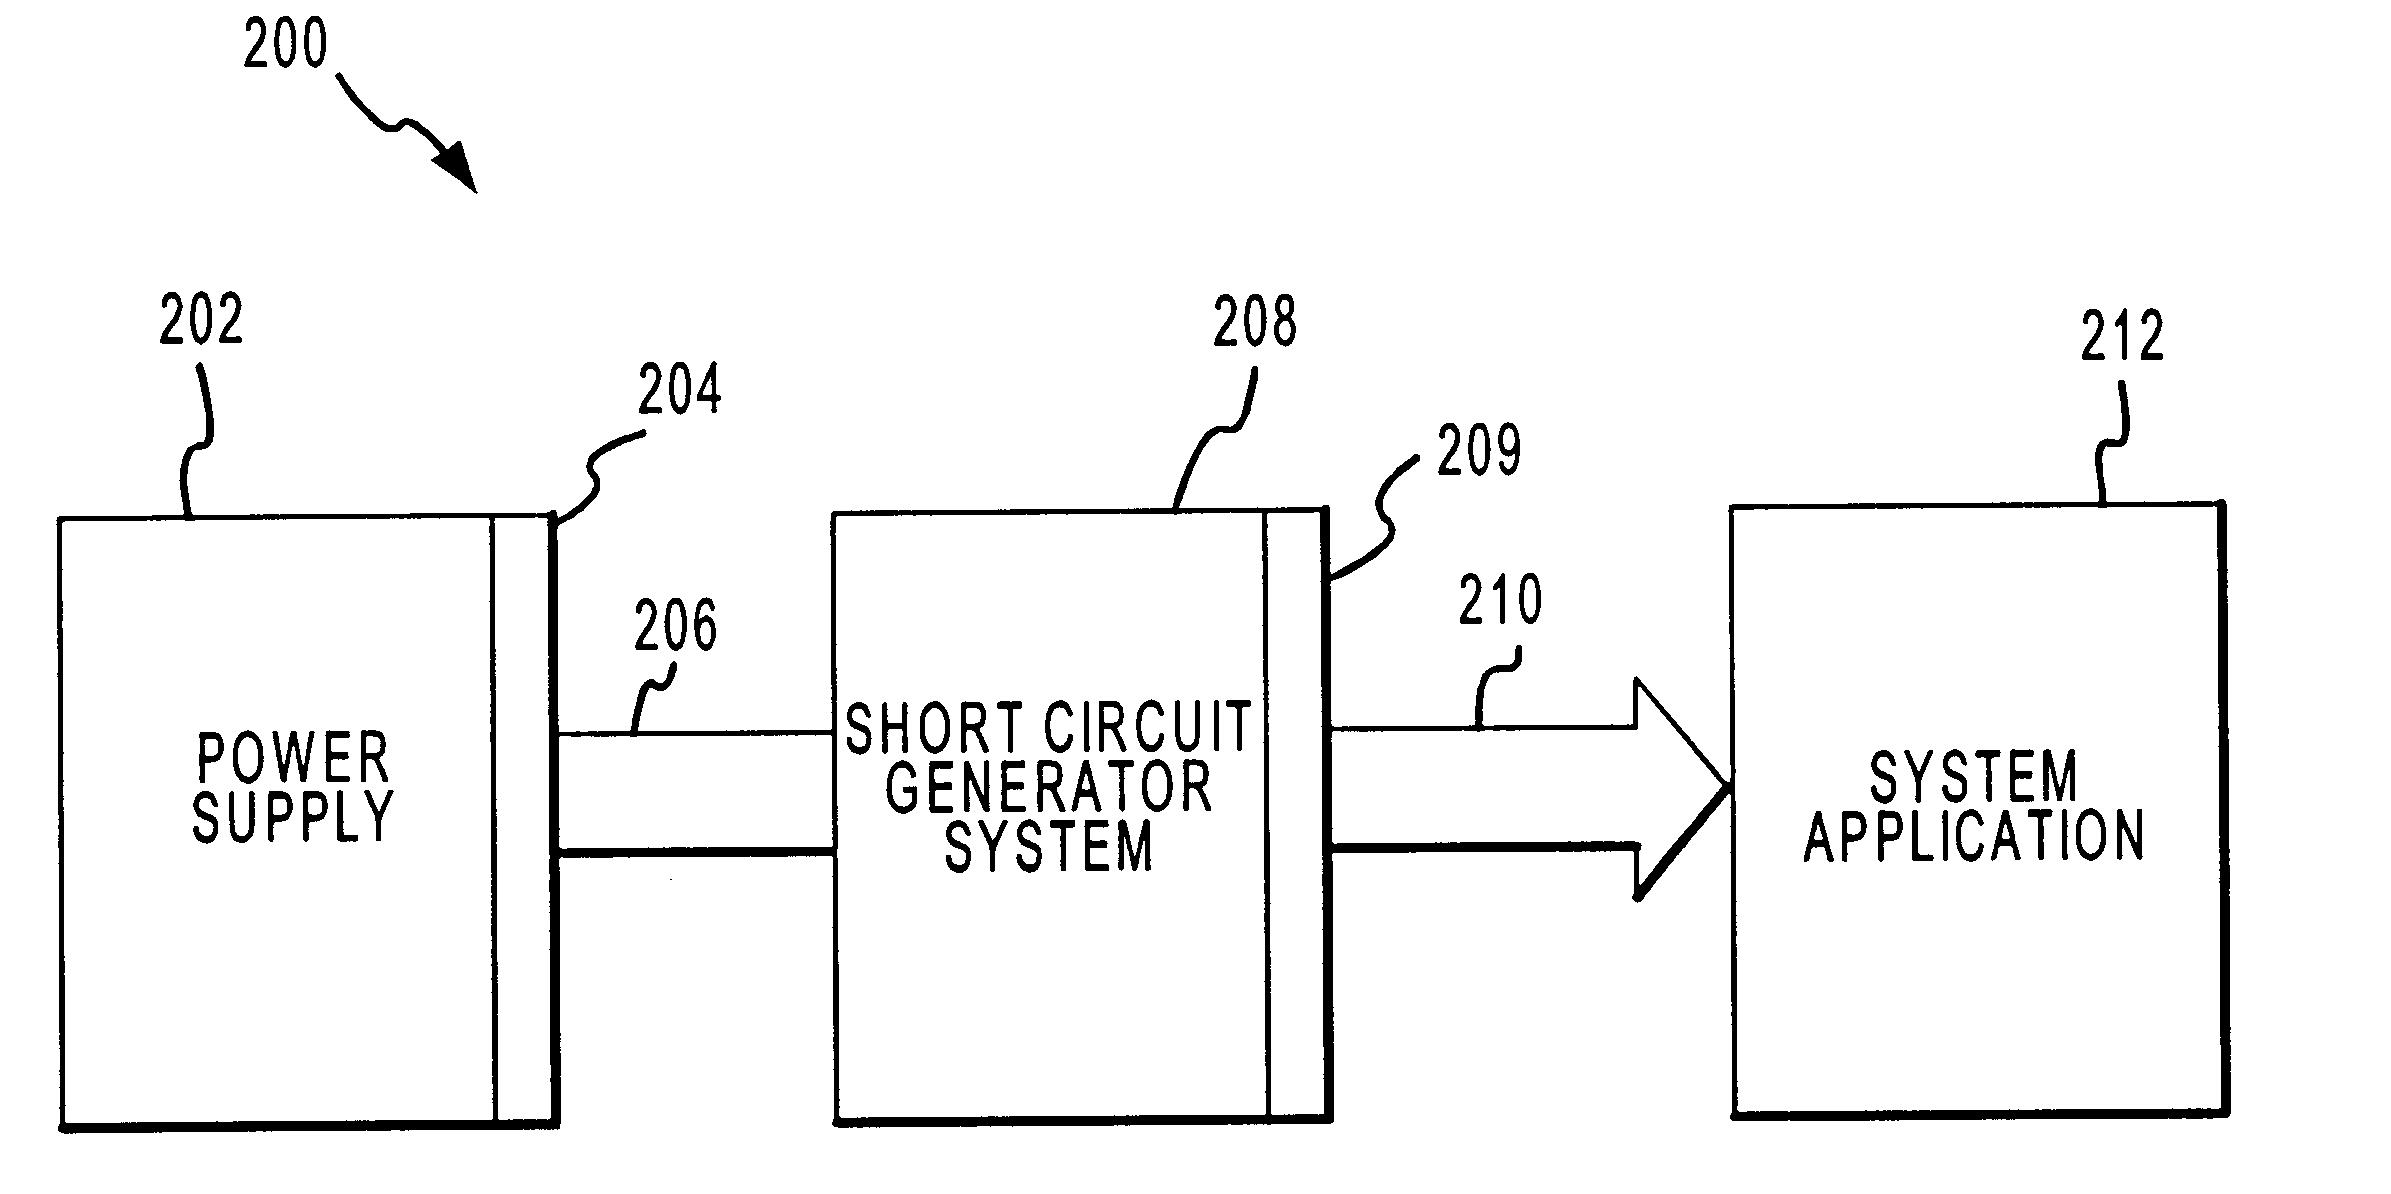 patent us6677777 - short circuit generator for testing power supplies